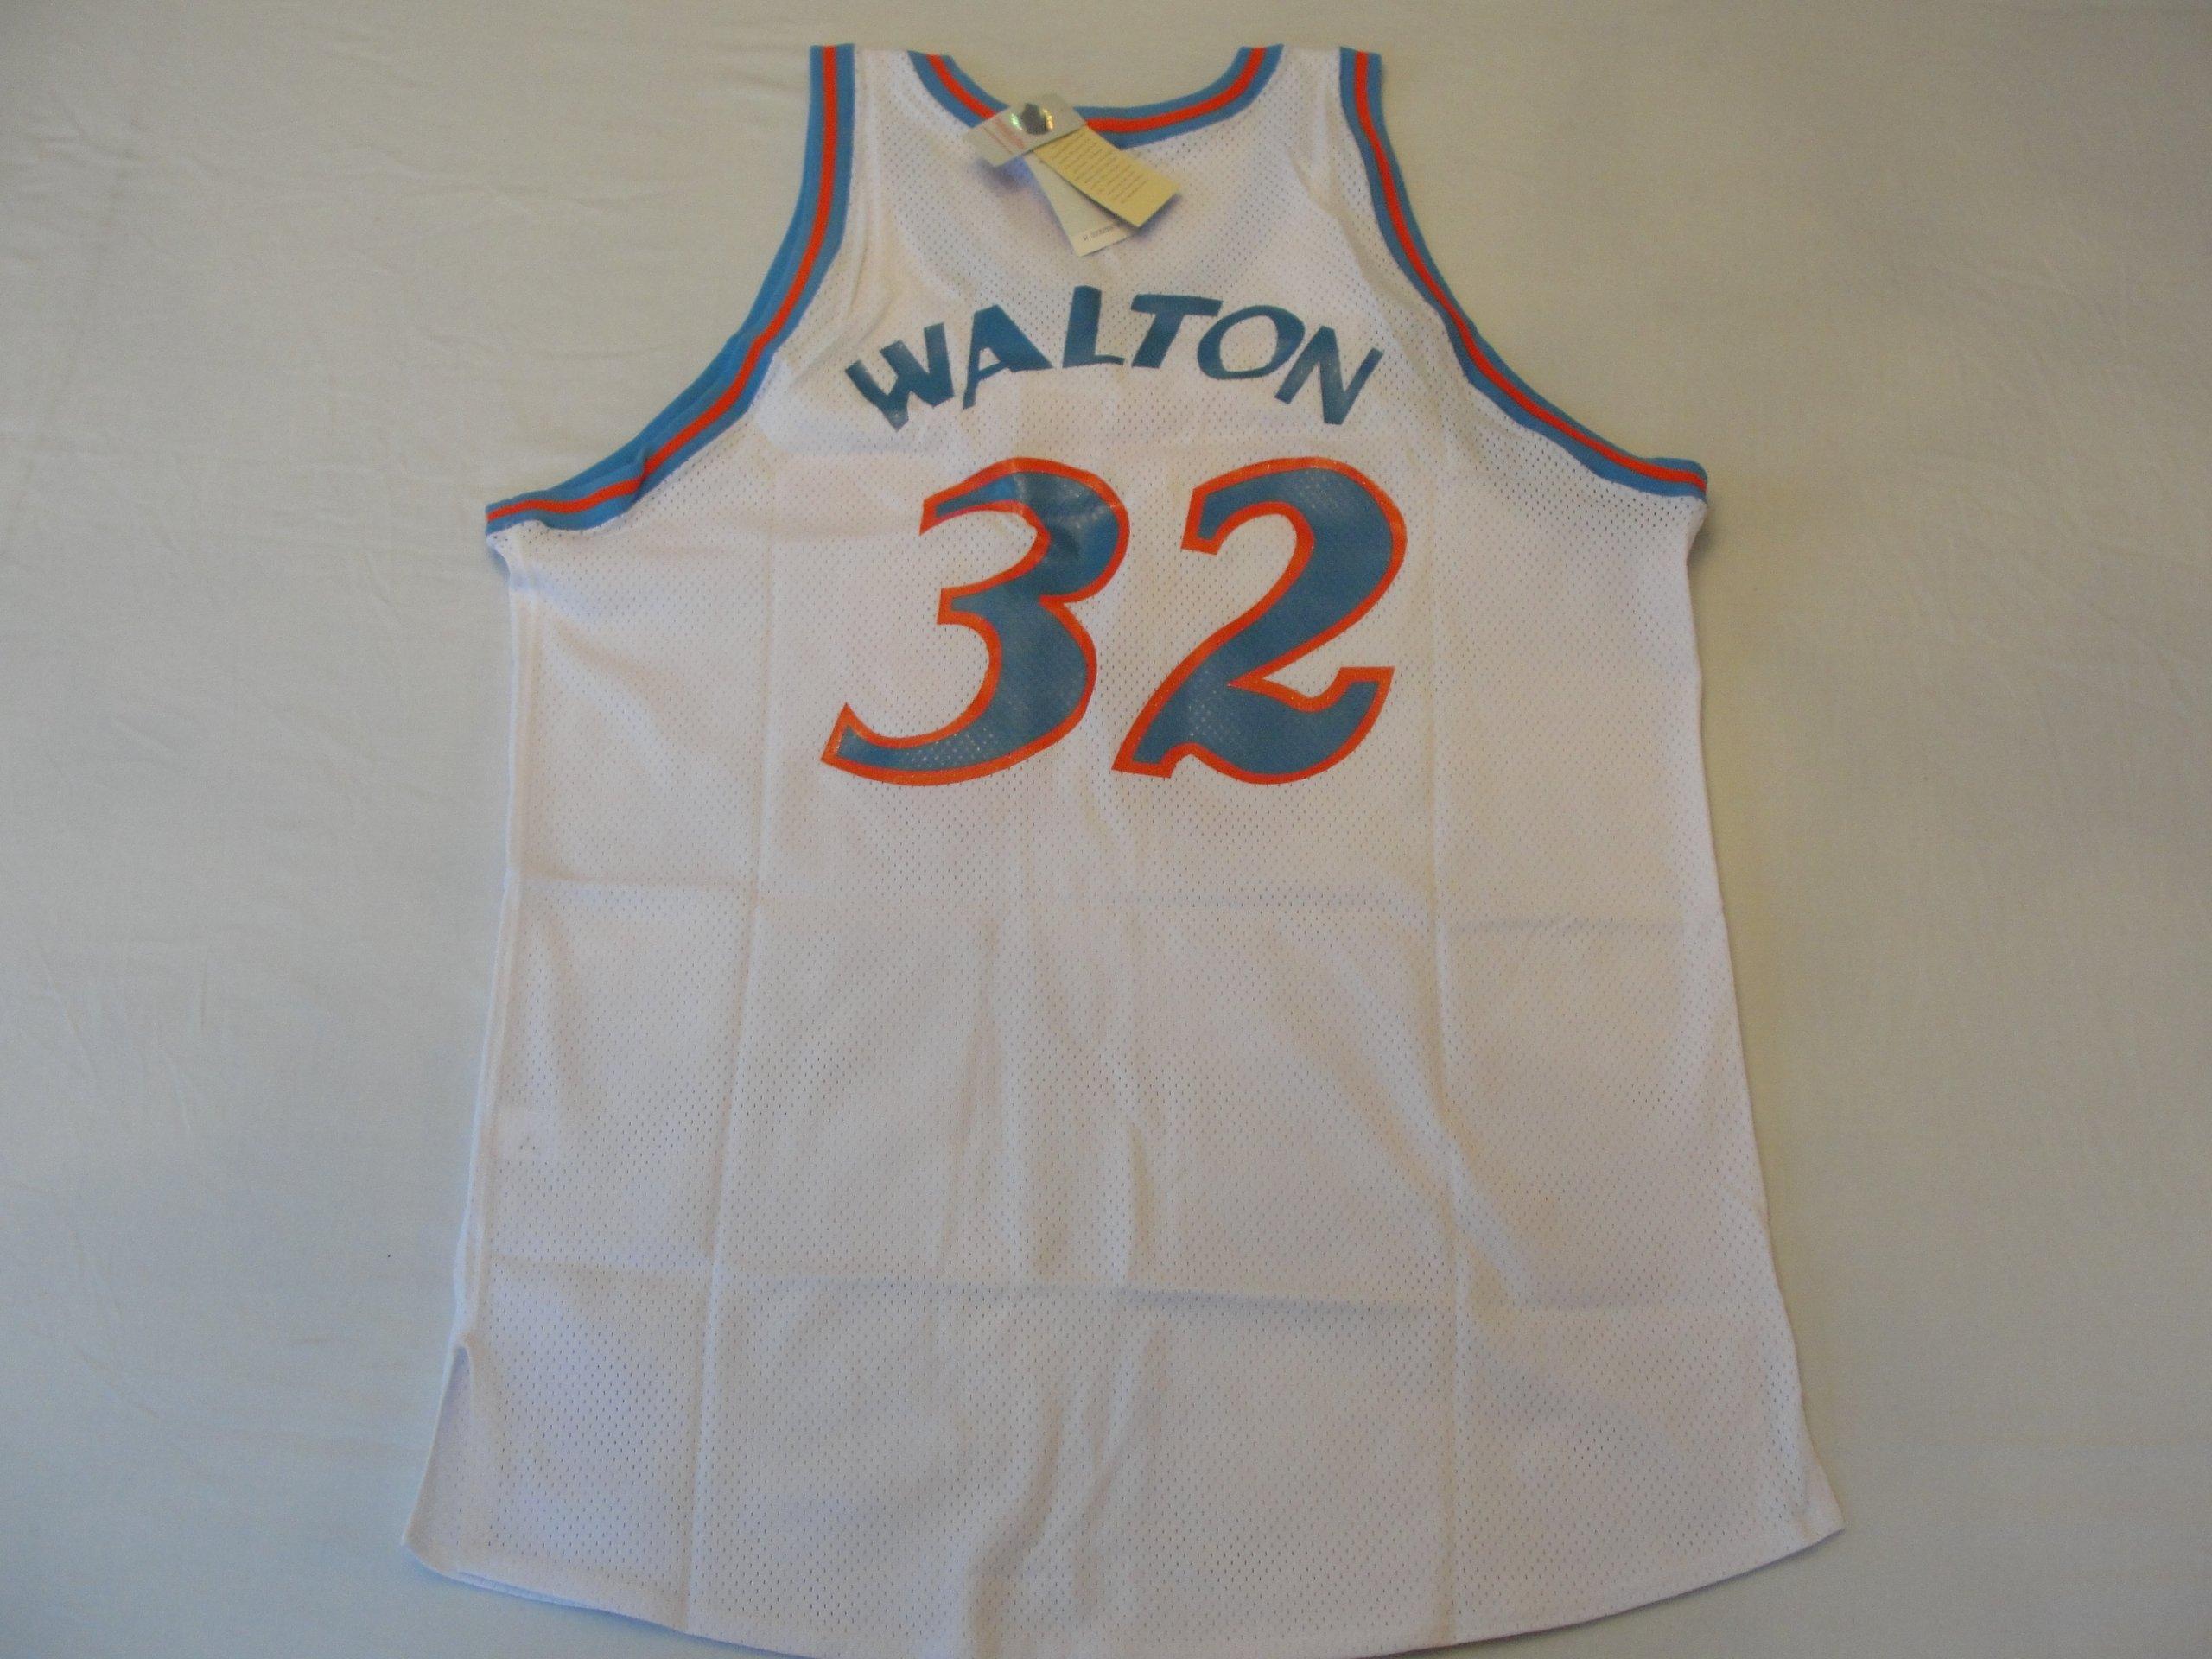 1b452044b6e44 San Diego Clippers Authentic 1979-80 Bill Walton #32 White Jersey By  Mitchell & Ness Size 56: 0697589055899: Amazon.com: Books